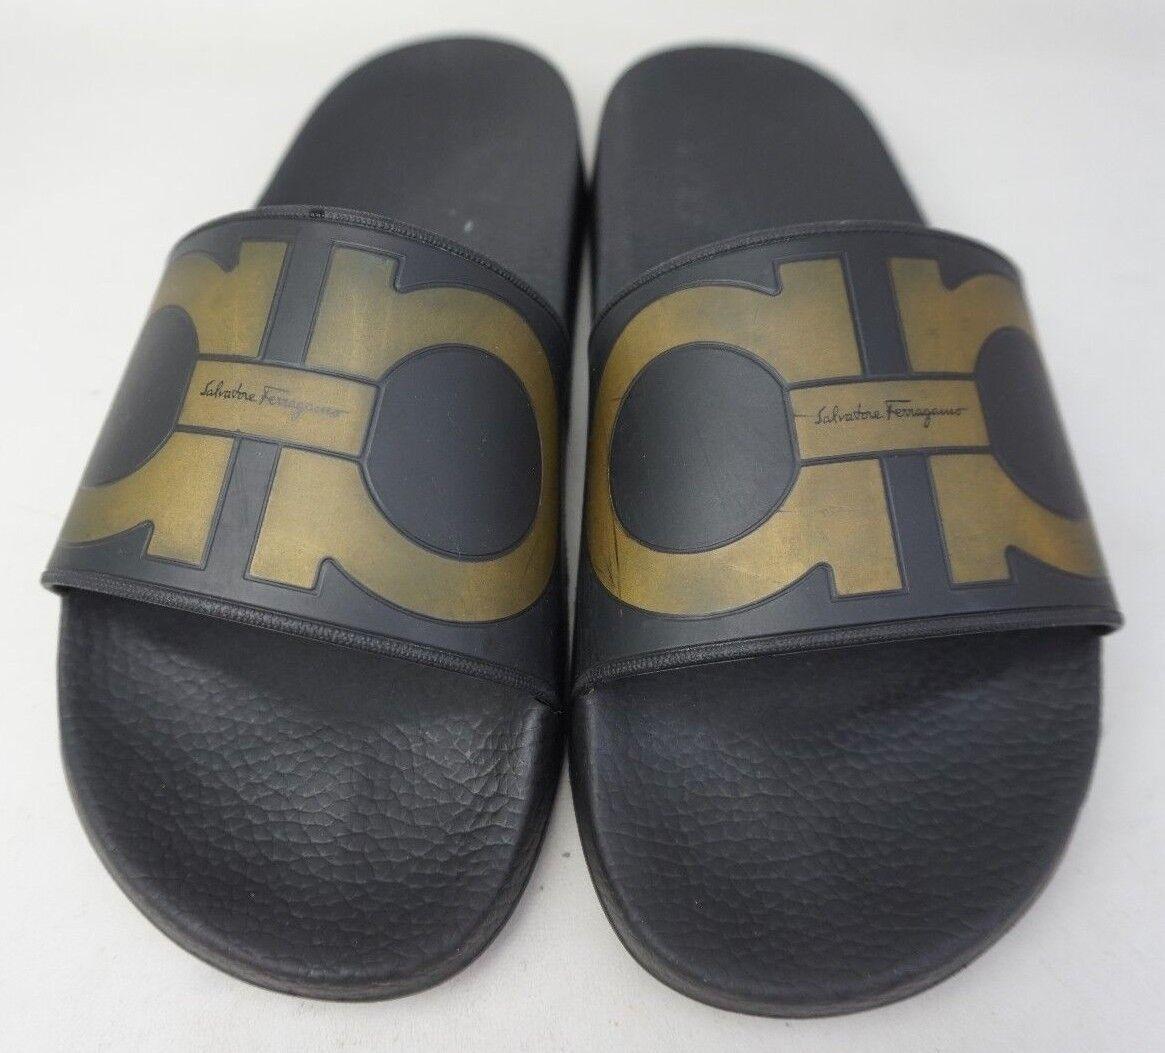 Salvatore Ferragamo Groove Logo Spa Slide Black black gold Sandals Size 7 M Men's